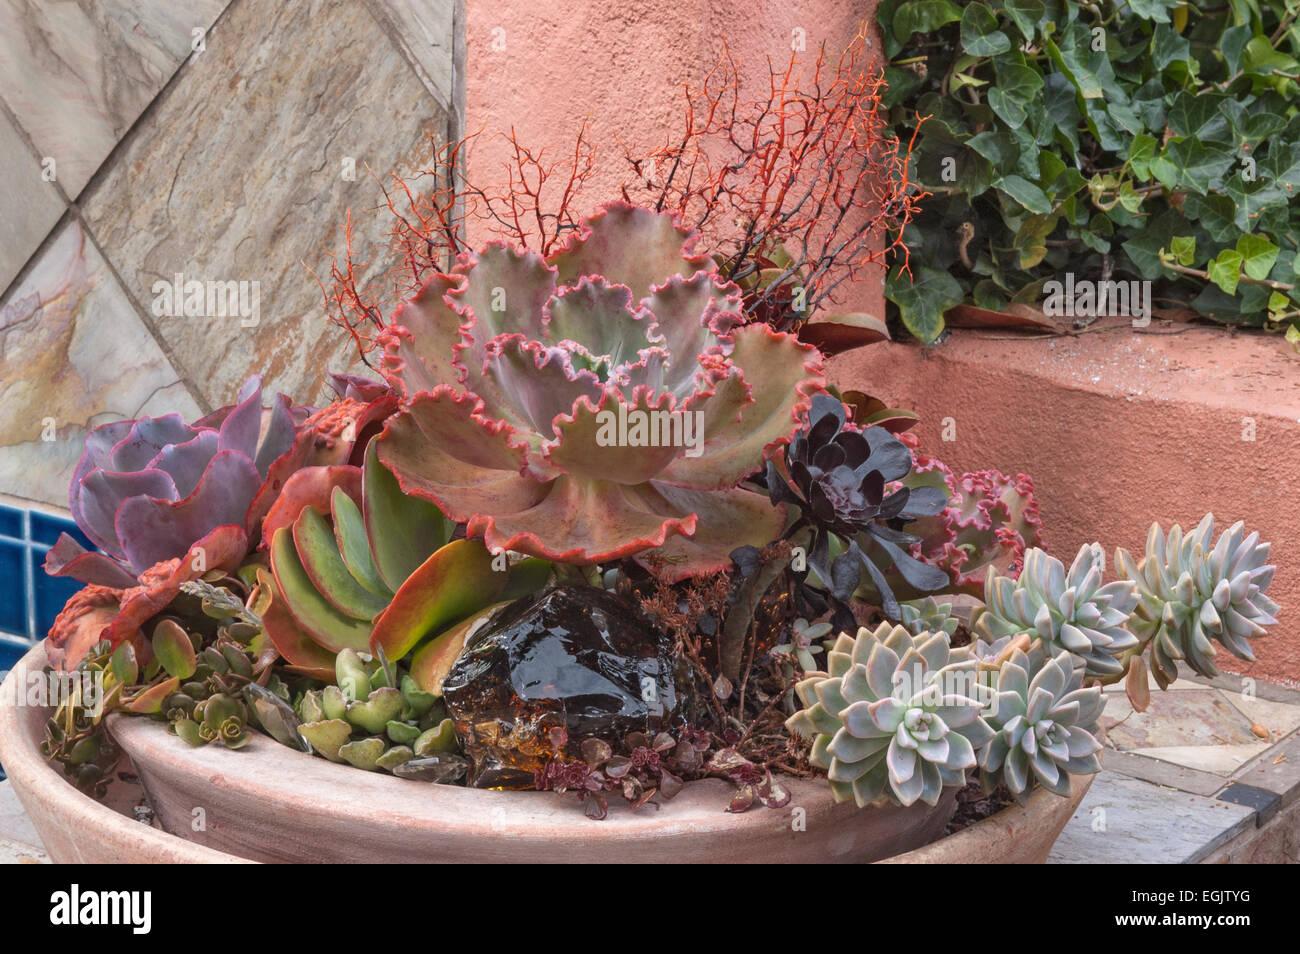 Mur Vegetal Plante Grasse plantes grasses photos & plantes grasses images - alamy